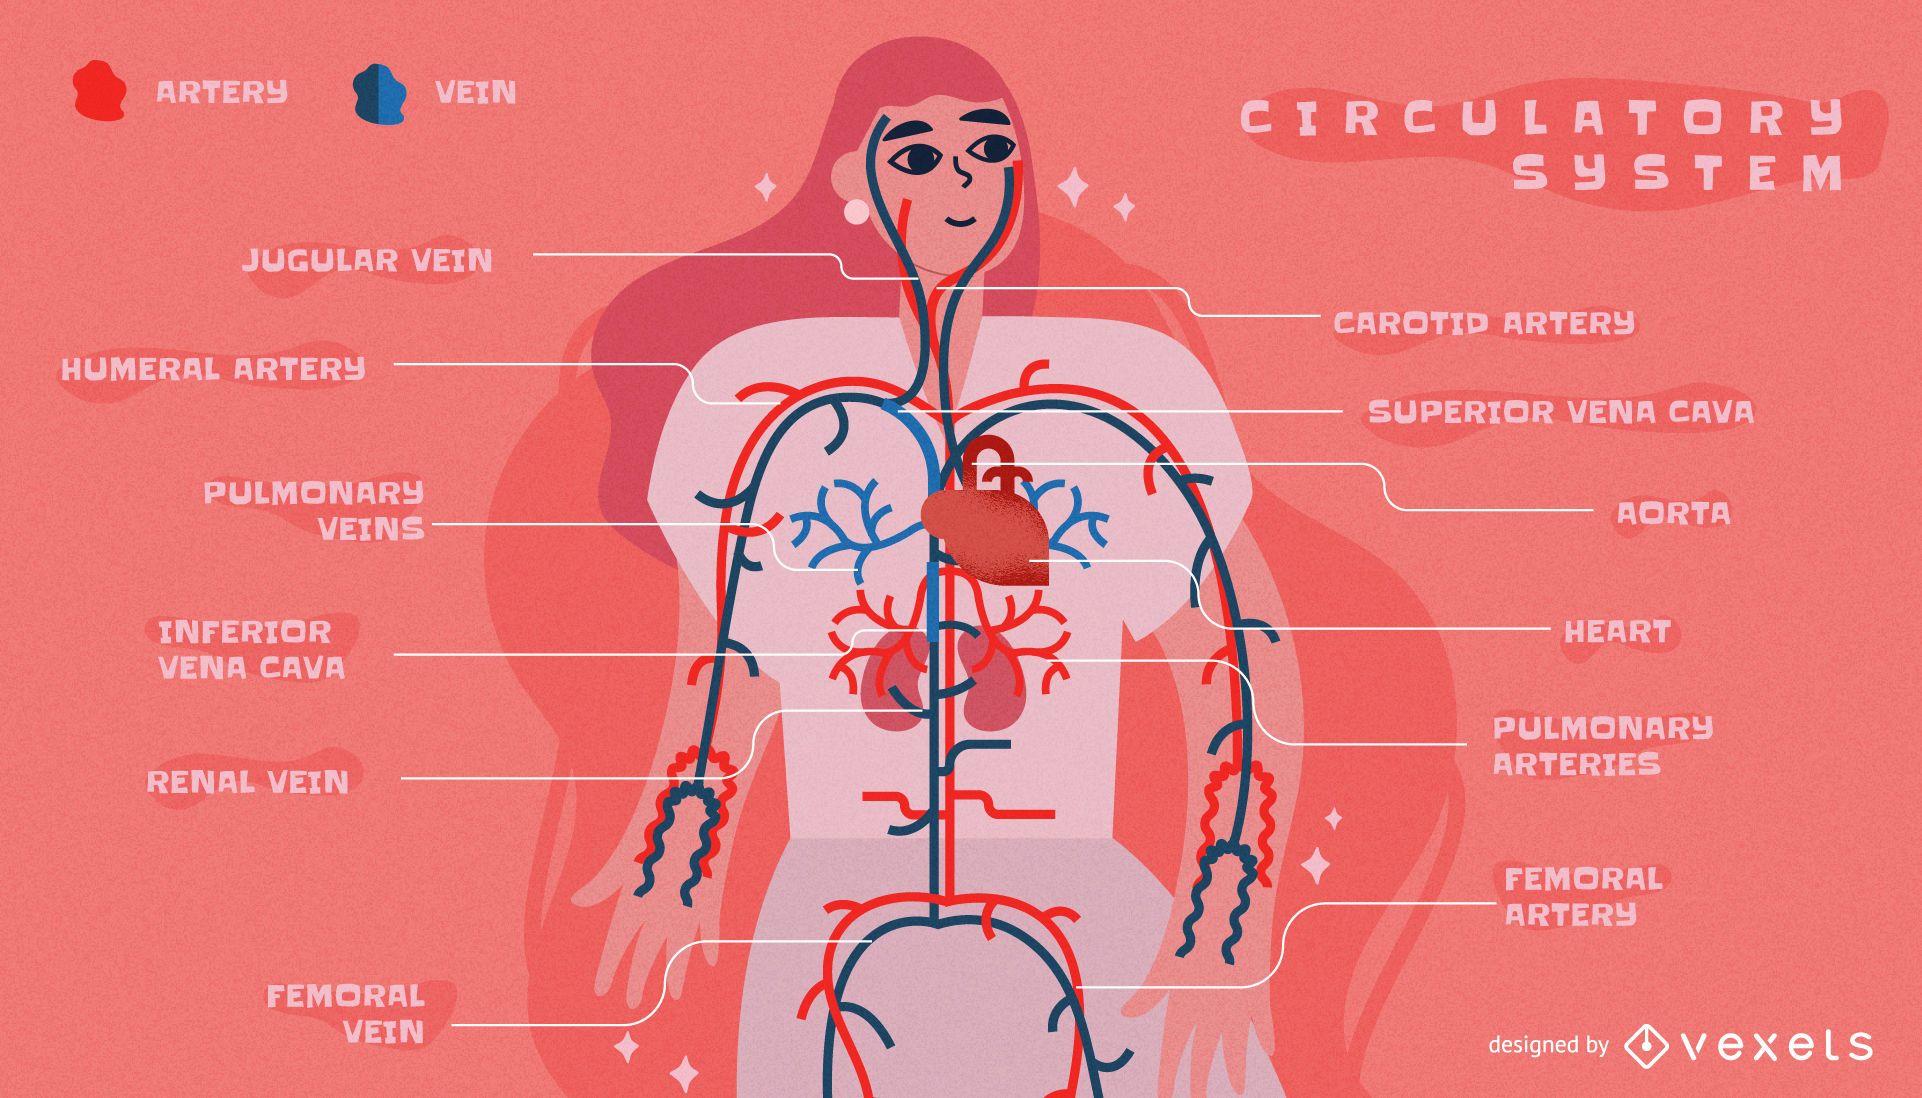 Plantilla de infograf?a del sistema circulatorio